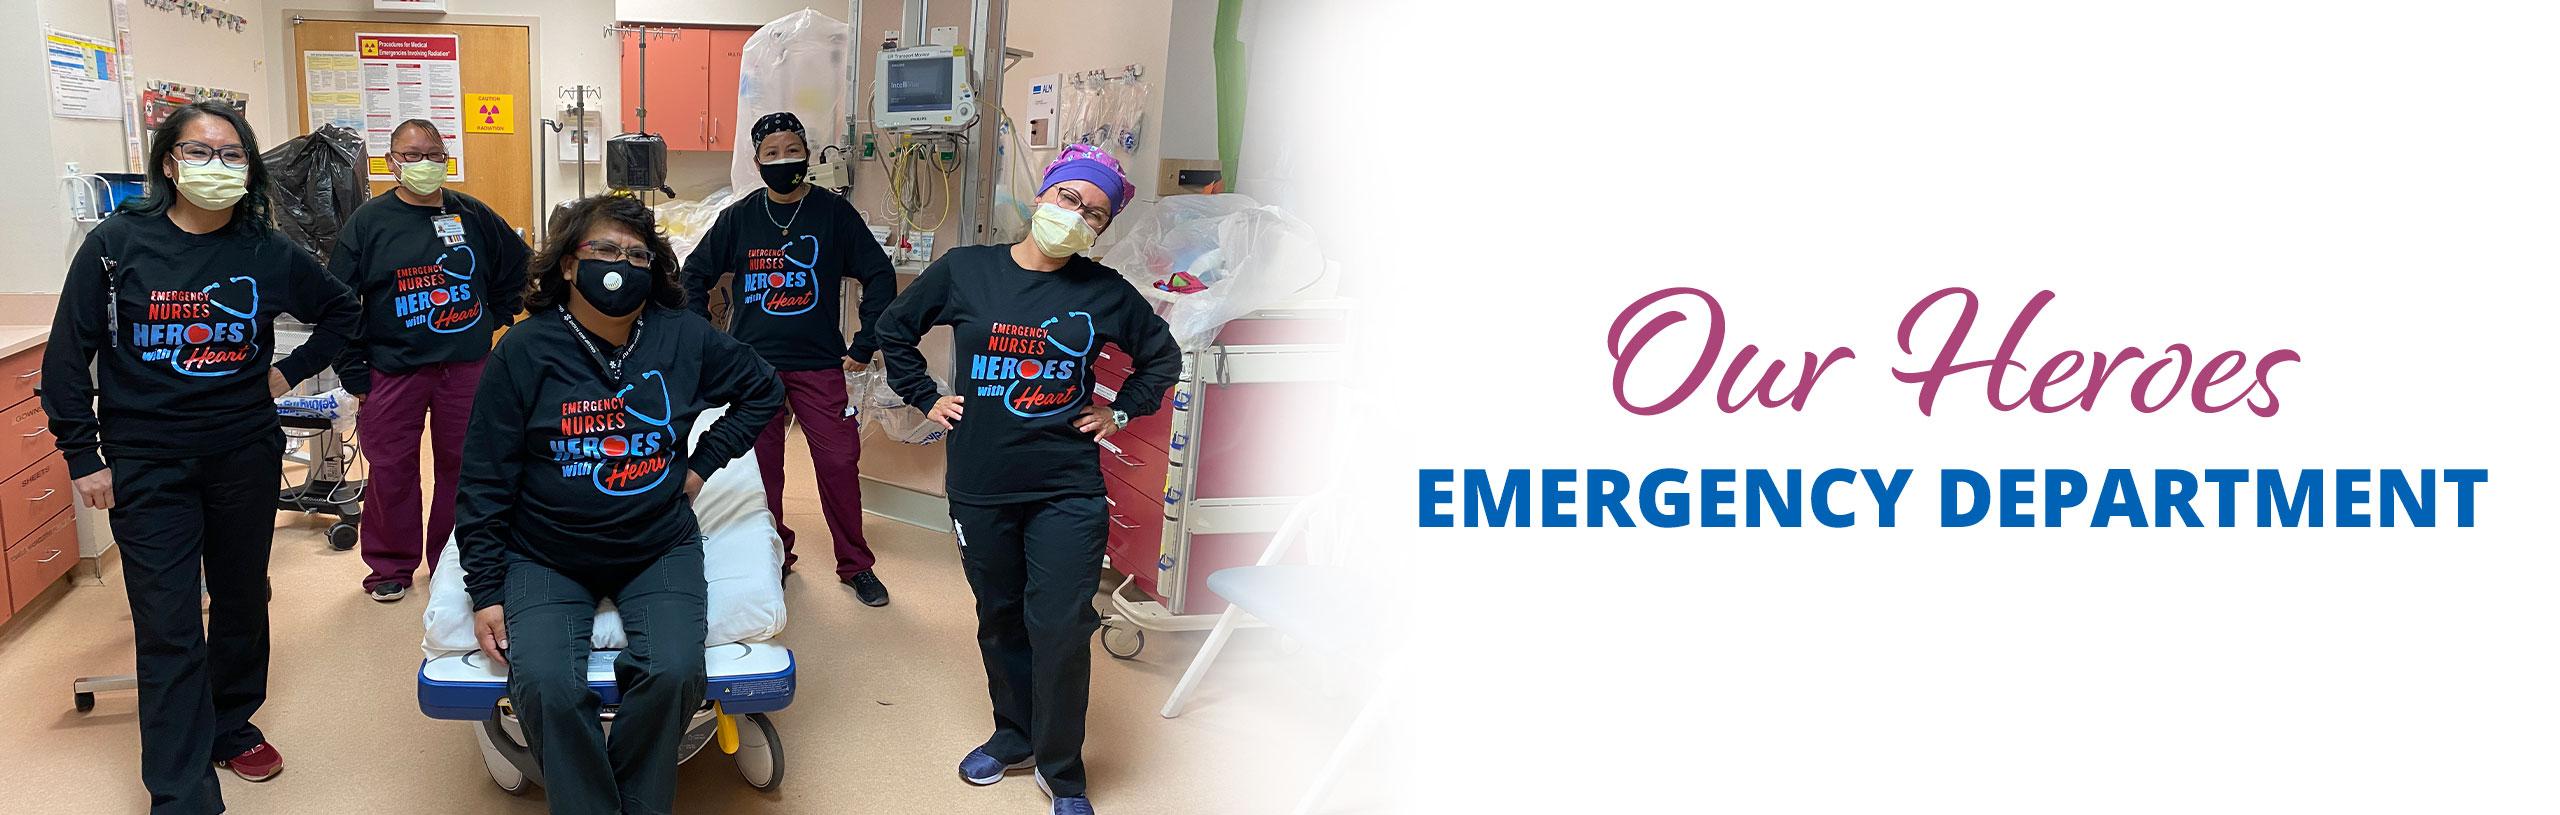 Our Heroes Emergency Department.